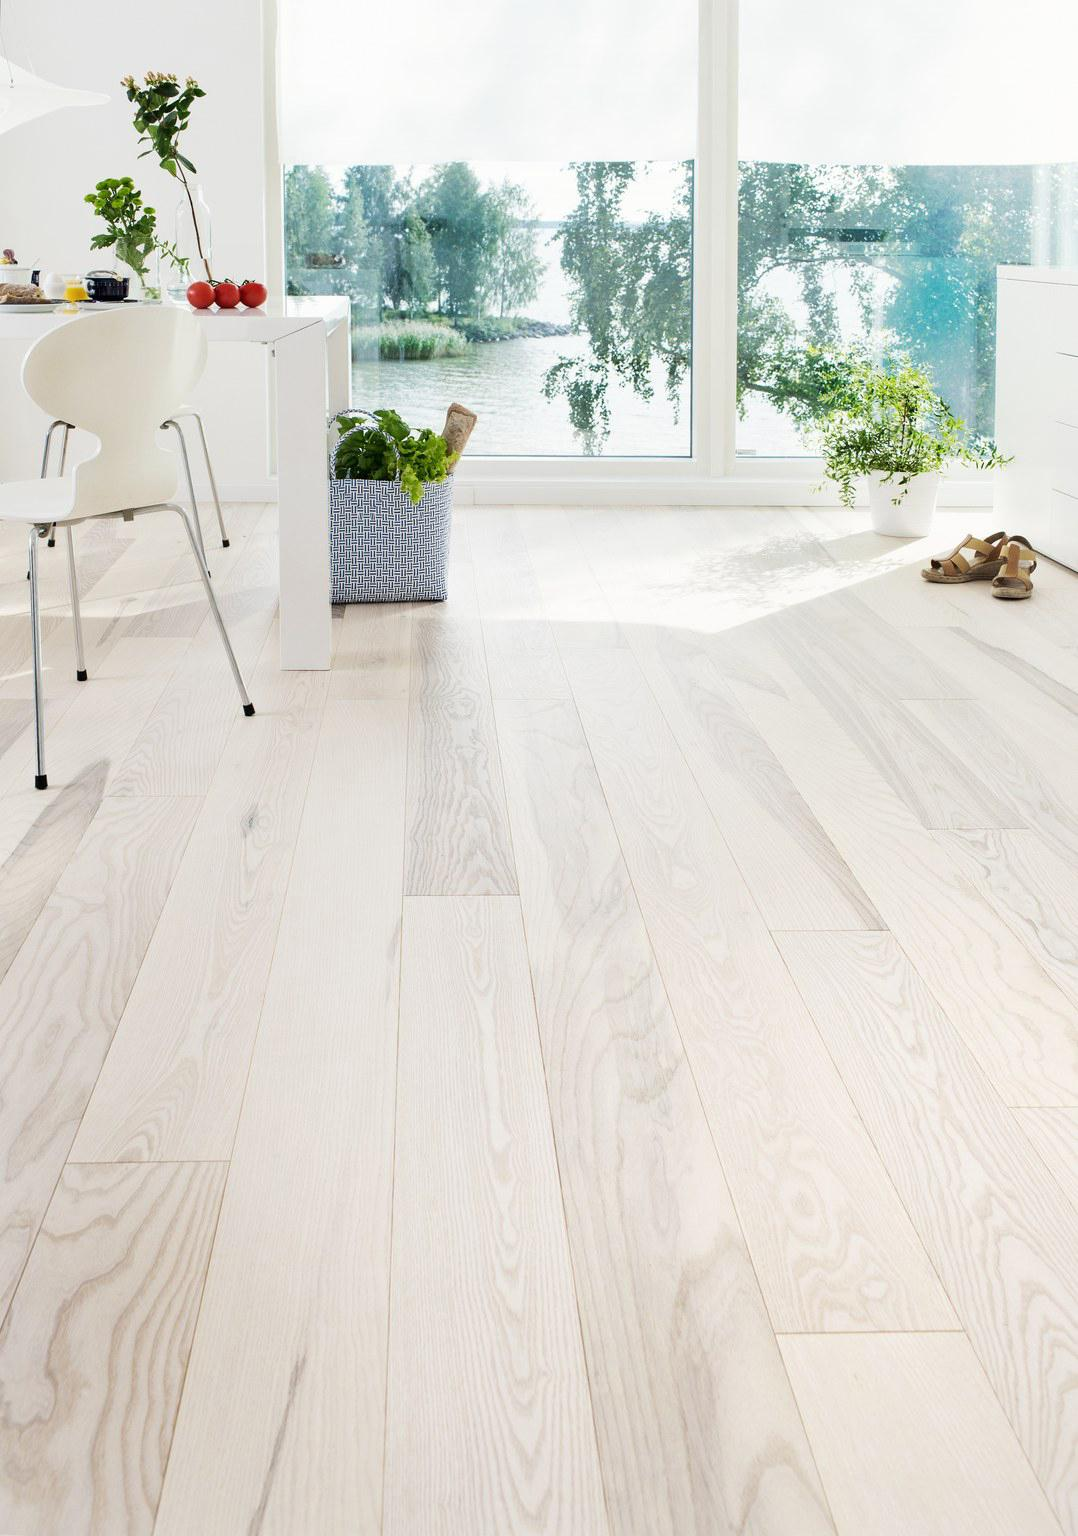 Timberwise-saarni-ash-olive-hiottu-sand-valkomattalakattu-white-matt-lacquered (1)